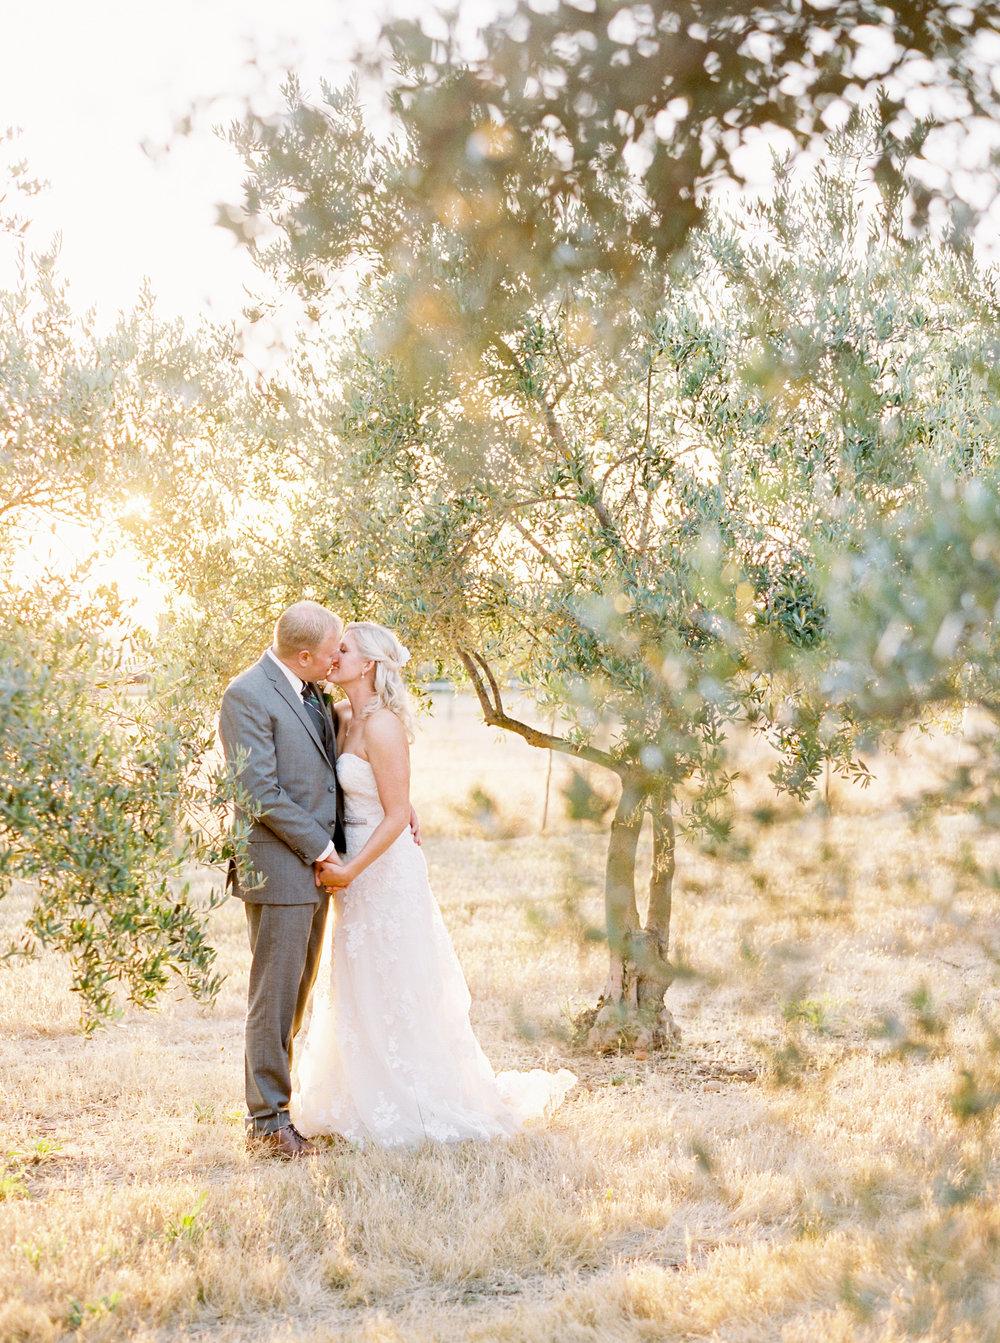 wolfe-heights-event-center-wedding-sacramento-california-wedding-29.jpg